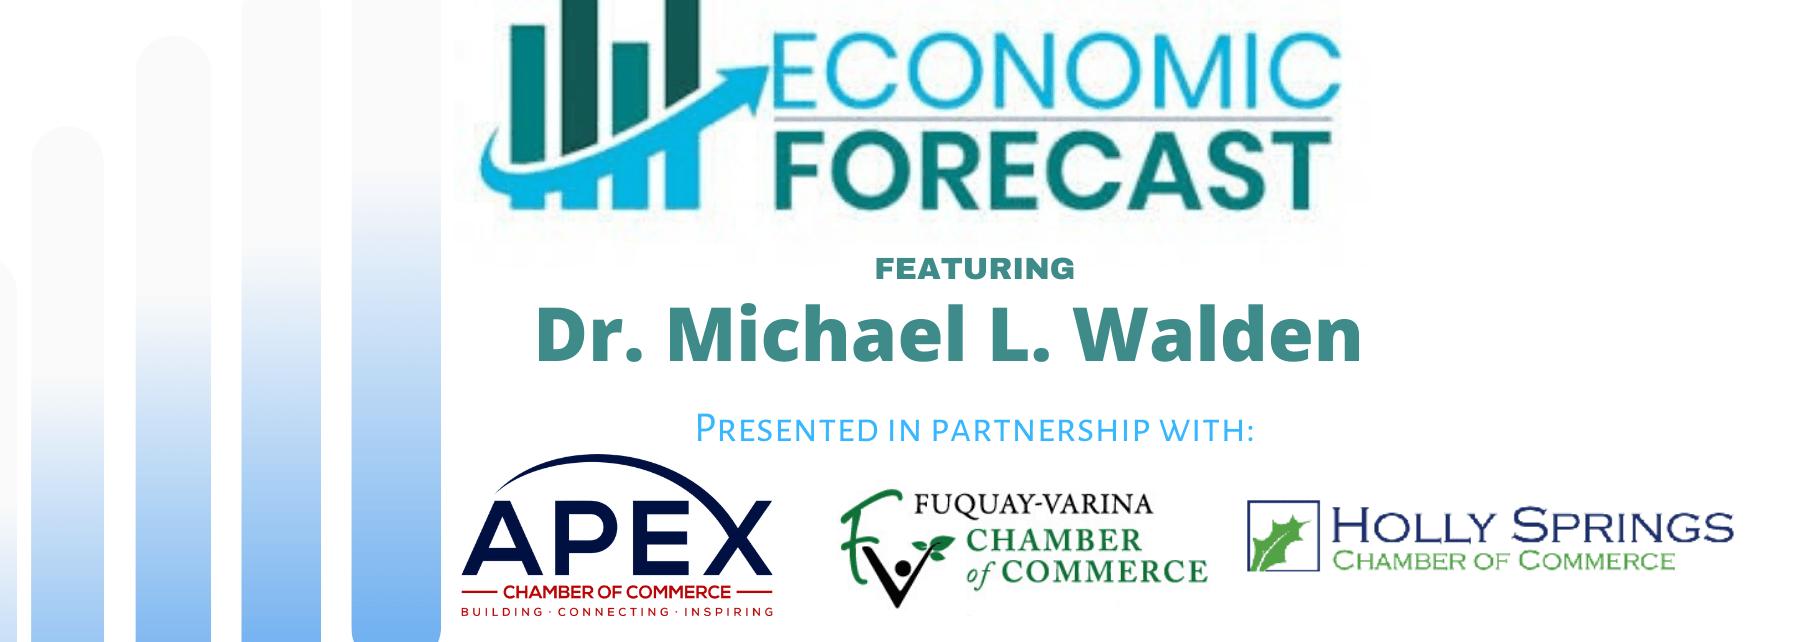 2019-economic-forecast-w1801.png